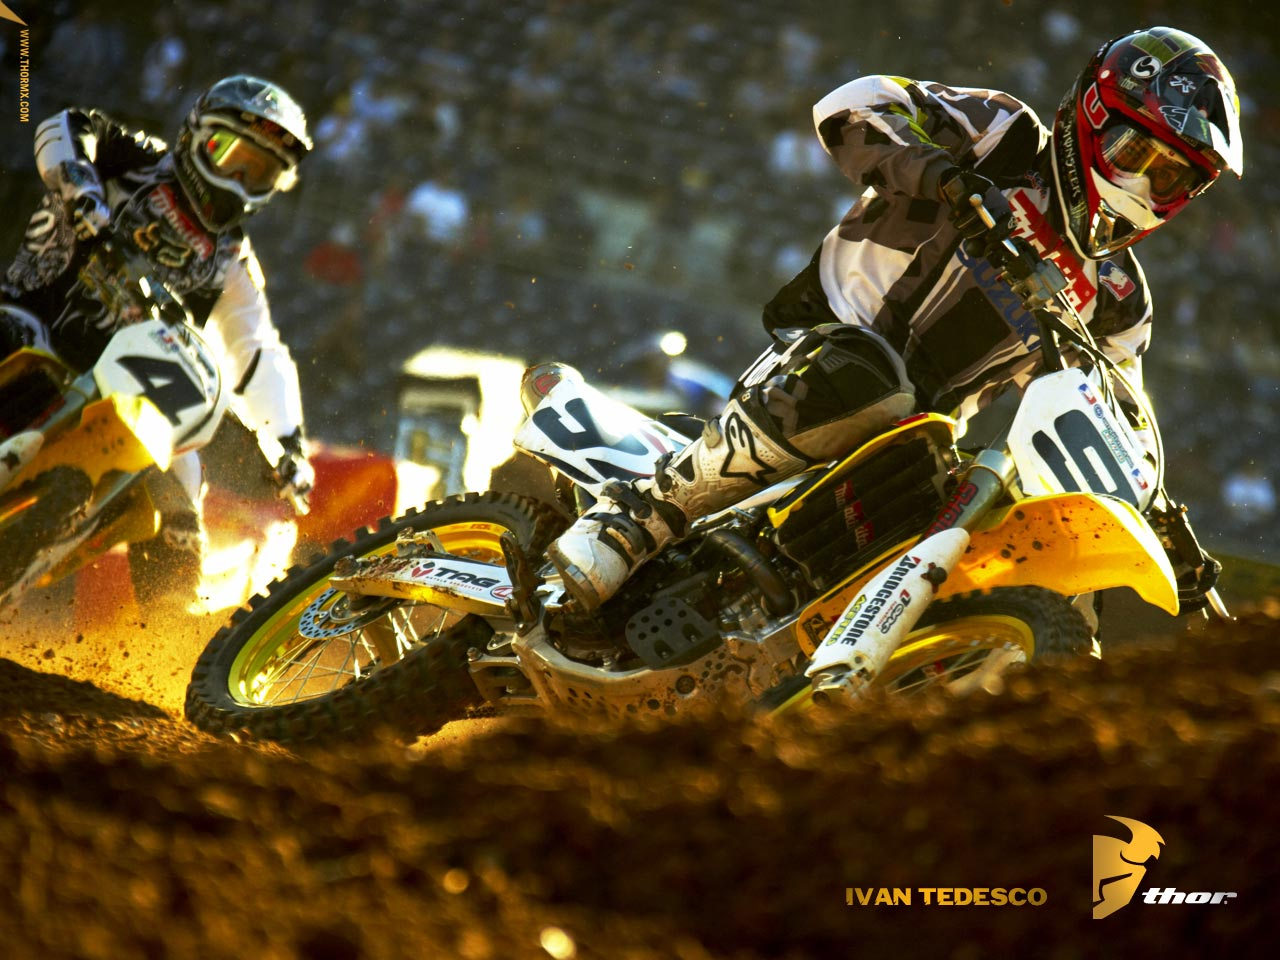 43 Fox Wallpapers Motocross On Wallpapersafari